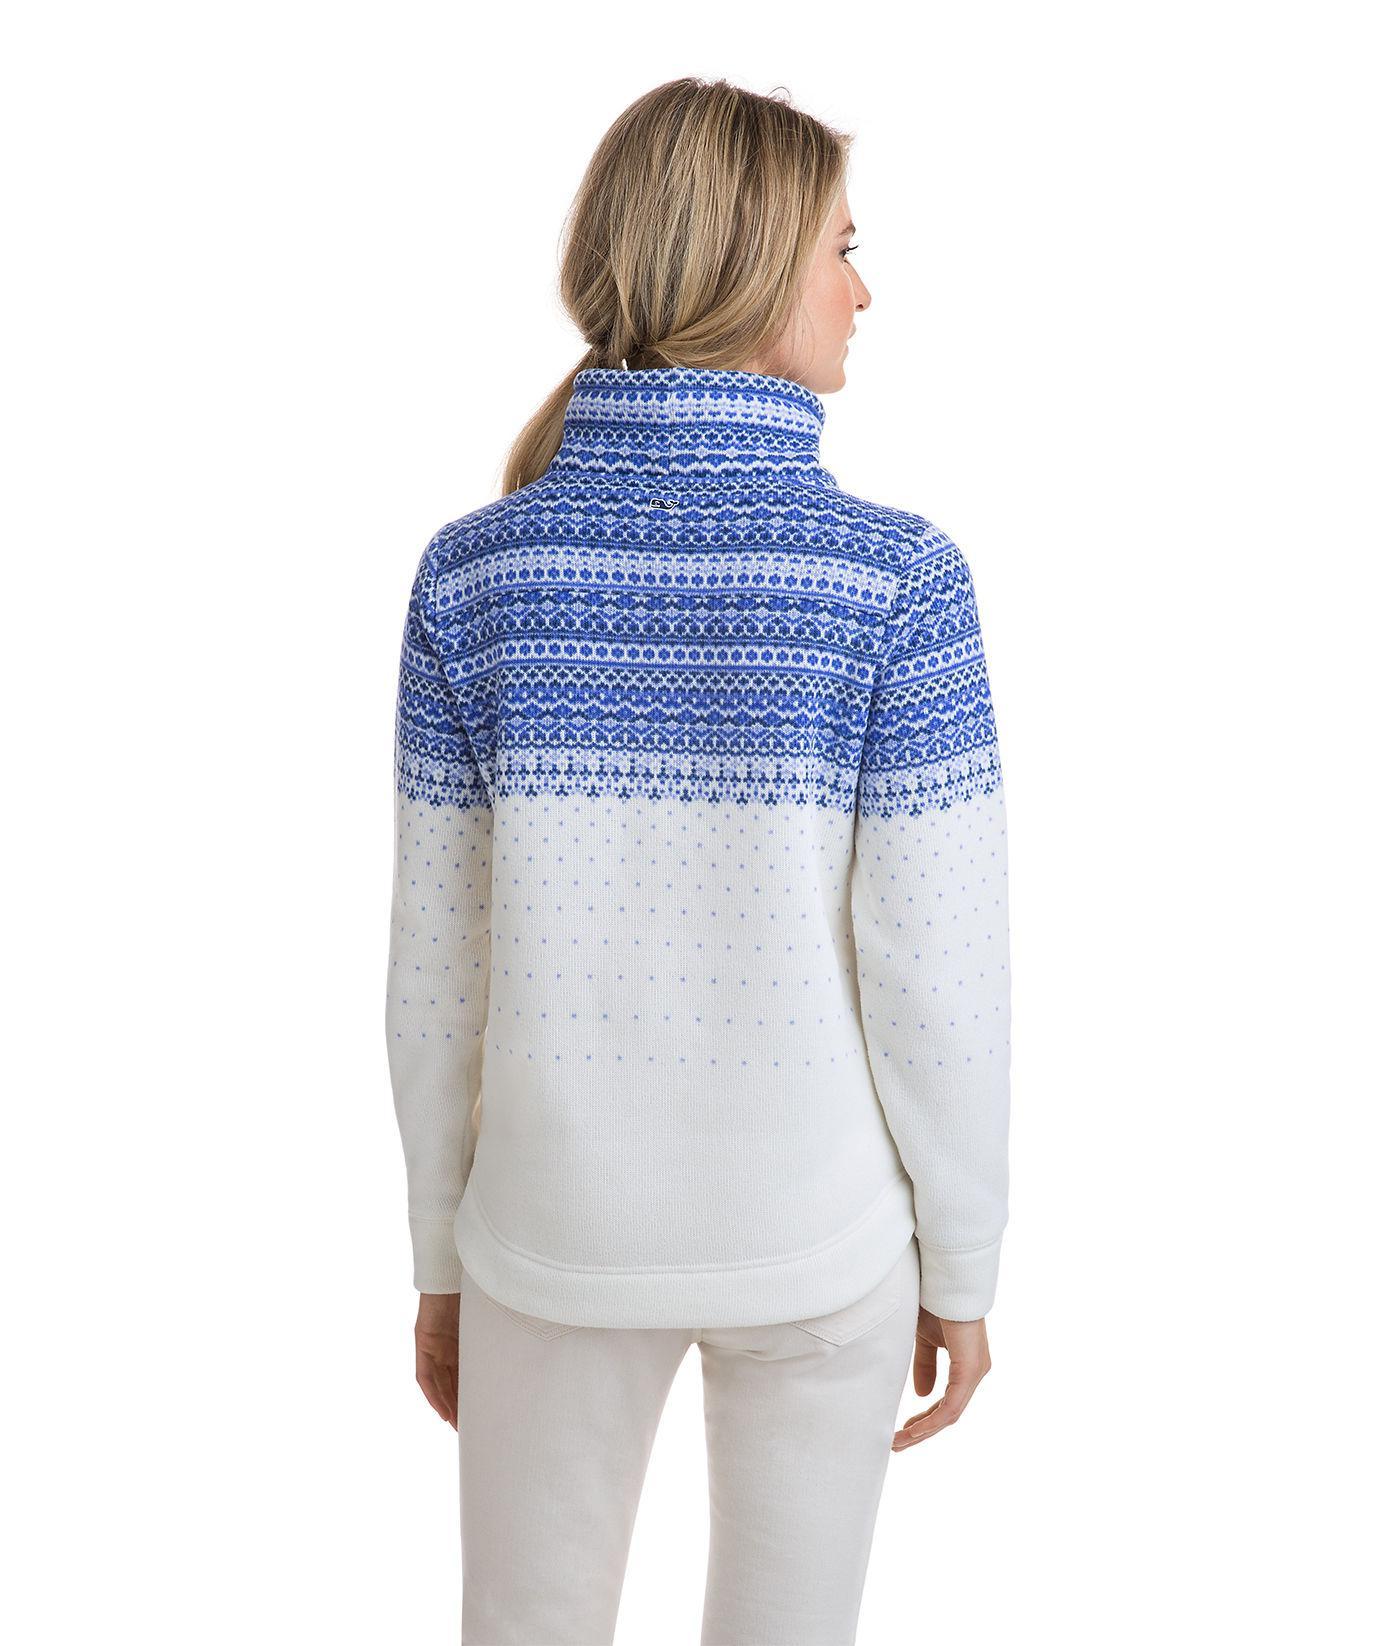 Vineyard vines Fair Isle Sweater Fleece Funnel Neck Shep Shirt in ...